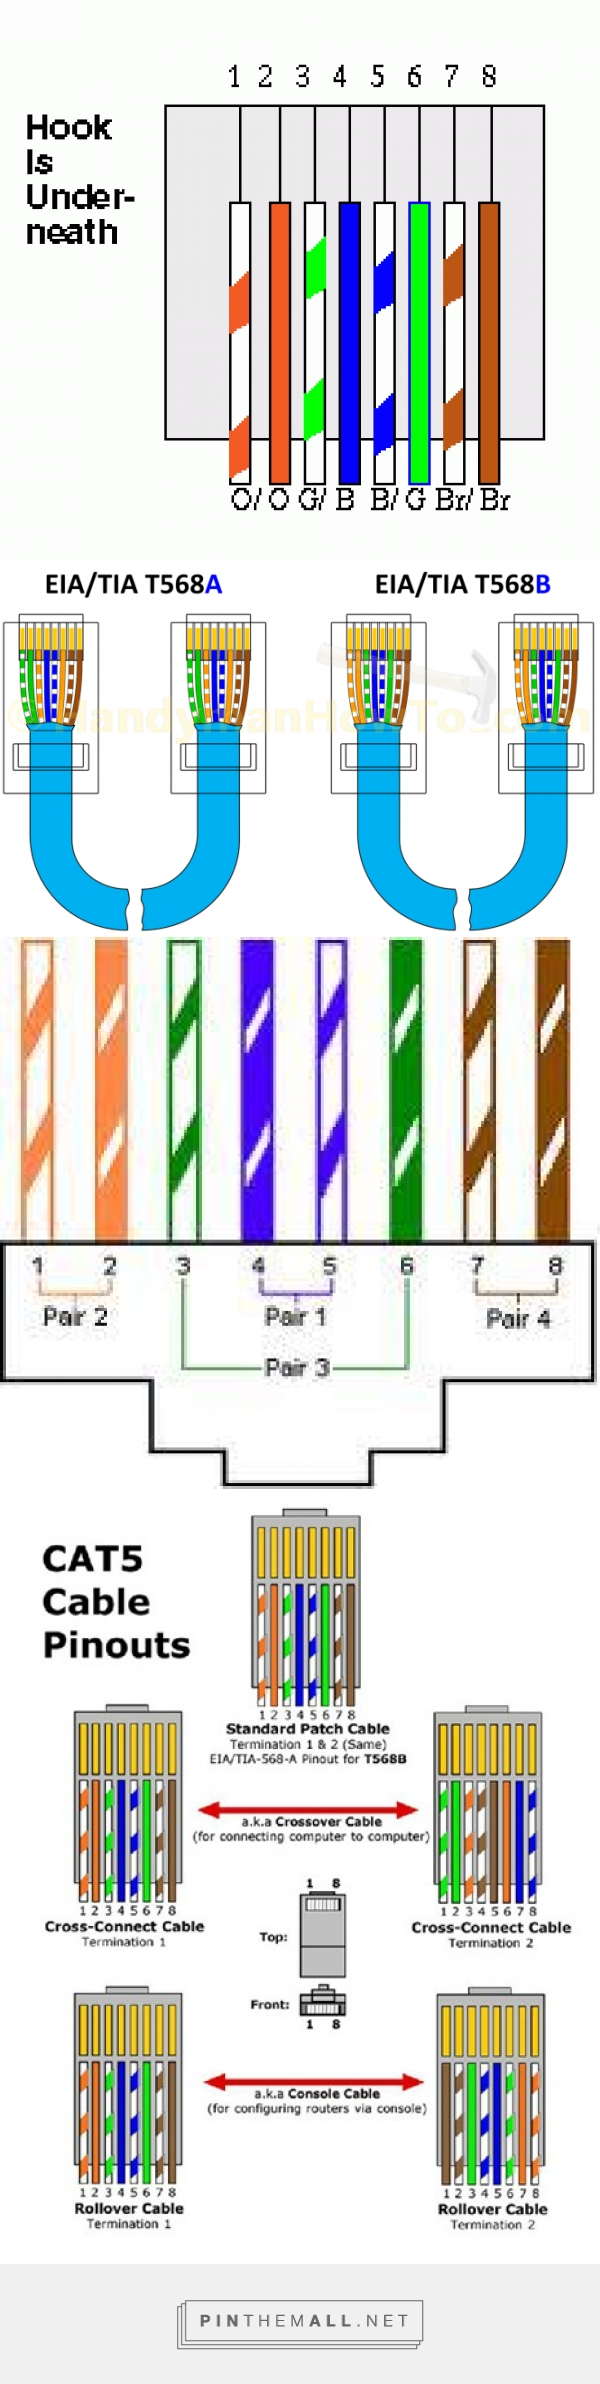 Standard Cat 5 Wire Diagram Coding